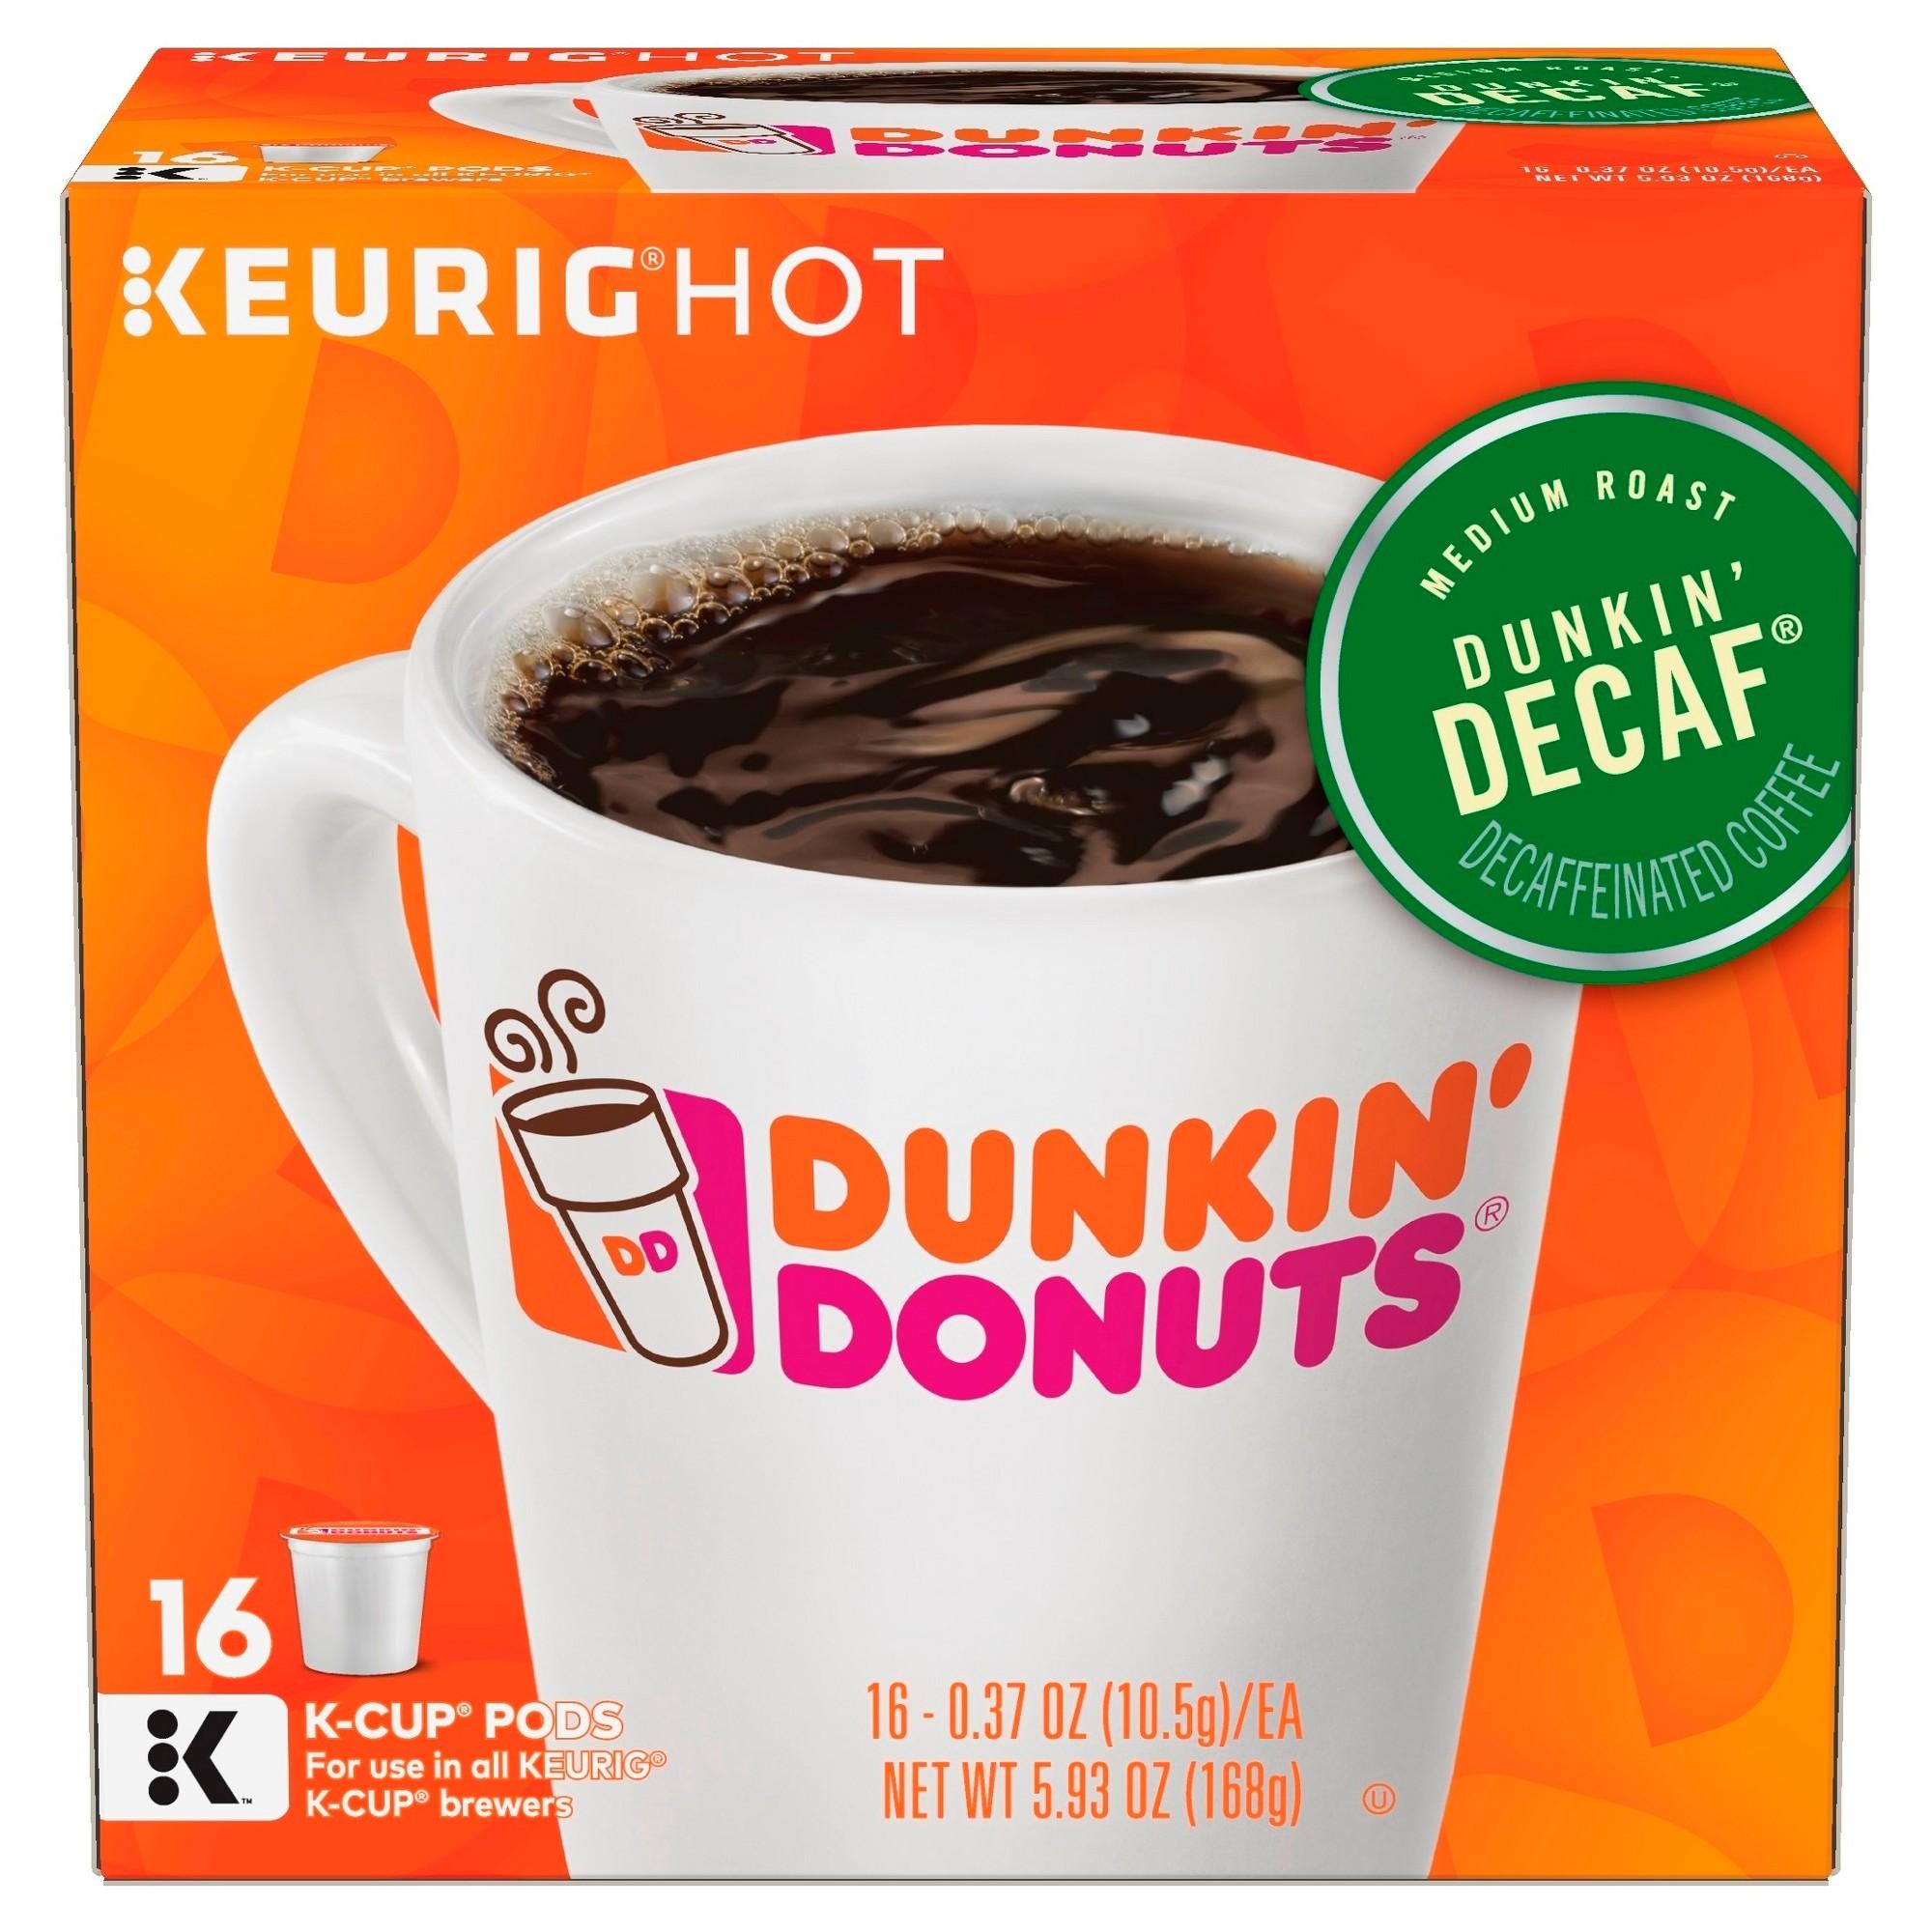 e1fafcaa991ee Dunkin' Donuts Dunkin' Decaf Medium Roast Coffee - Keurig K-Cup Pods ...